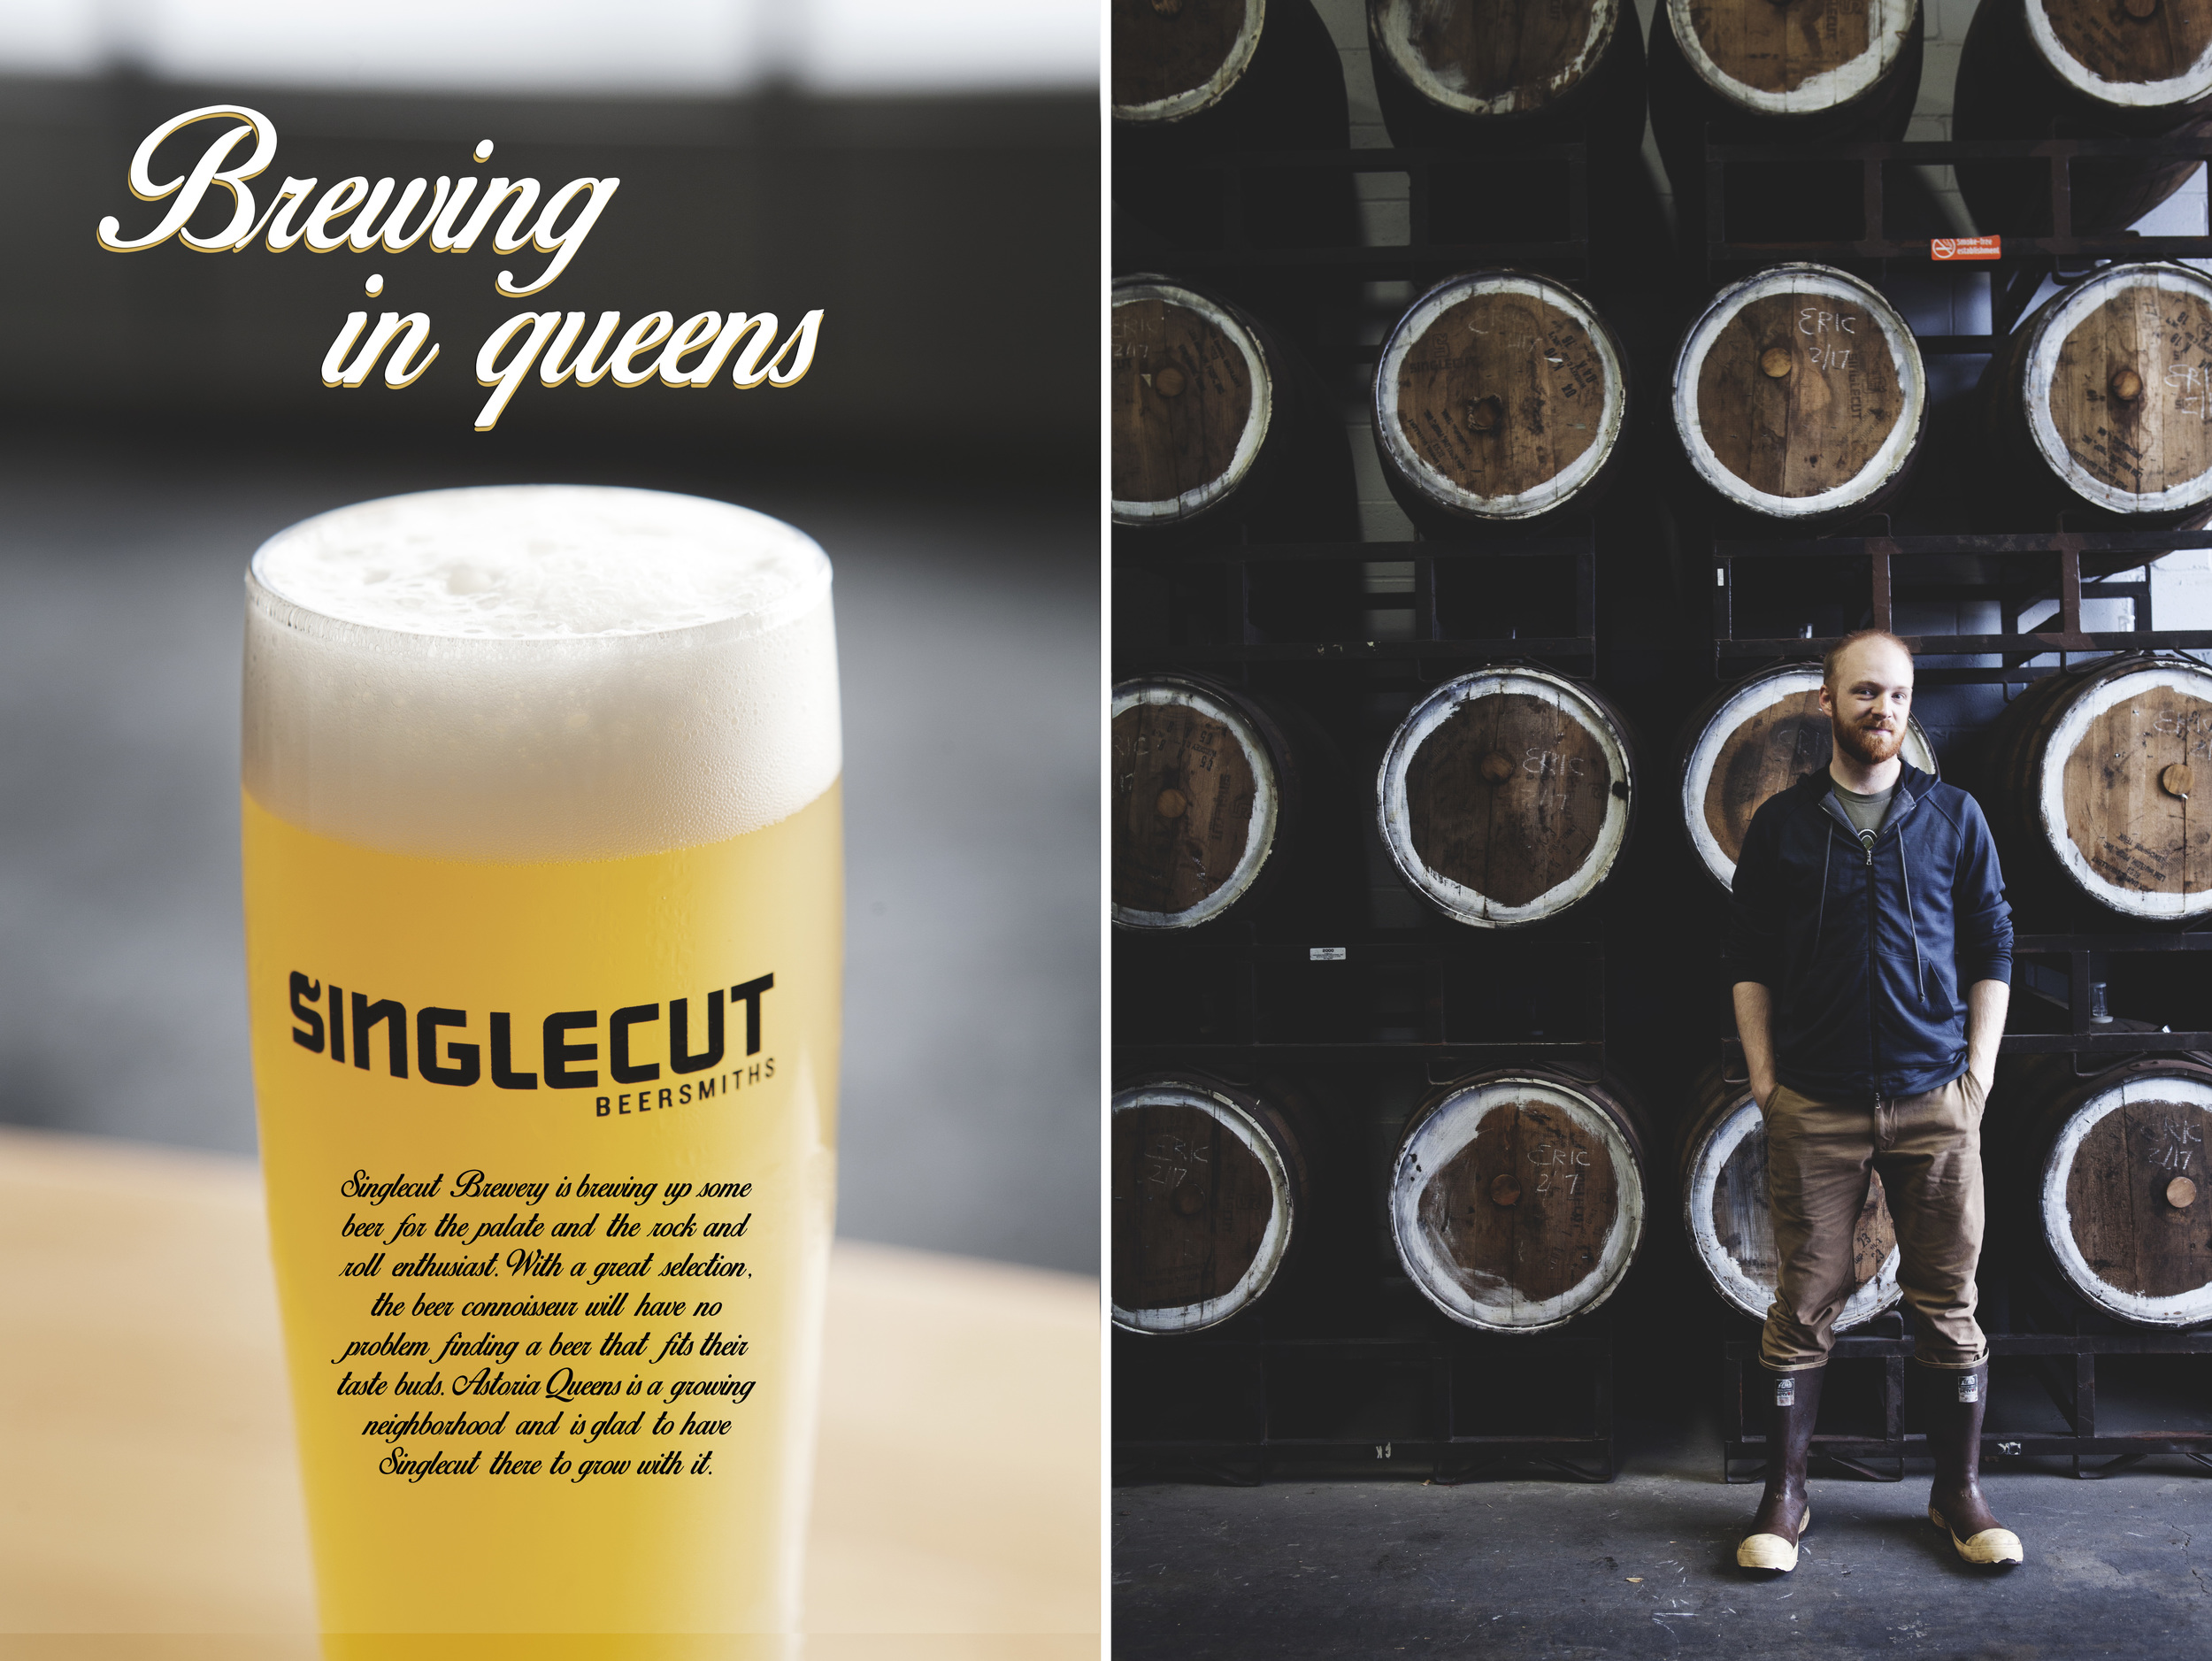 SingleCut_Brewery_spread1.jpg